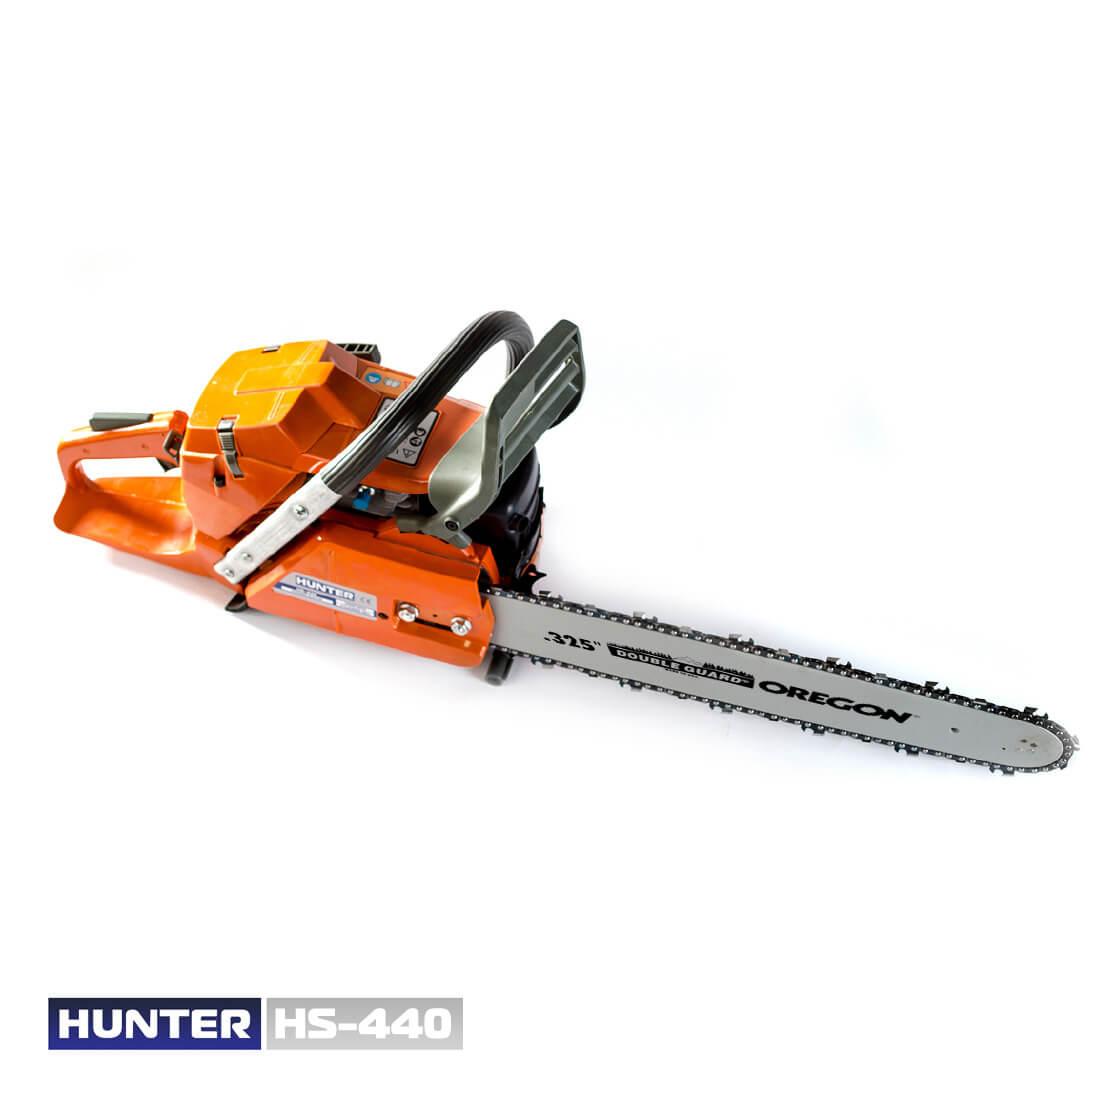 Фото Hunter HS-440 цена 7700грн №4 — Hunter